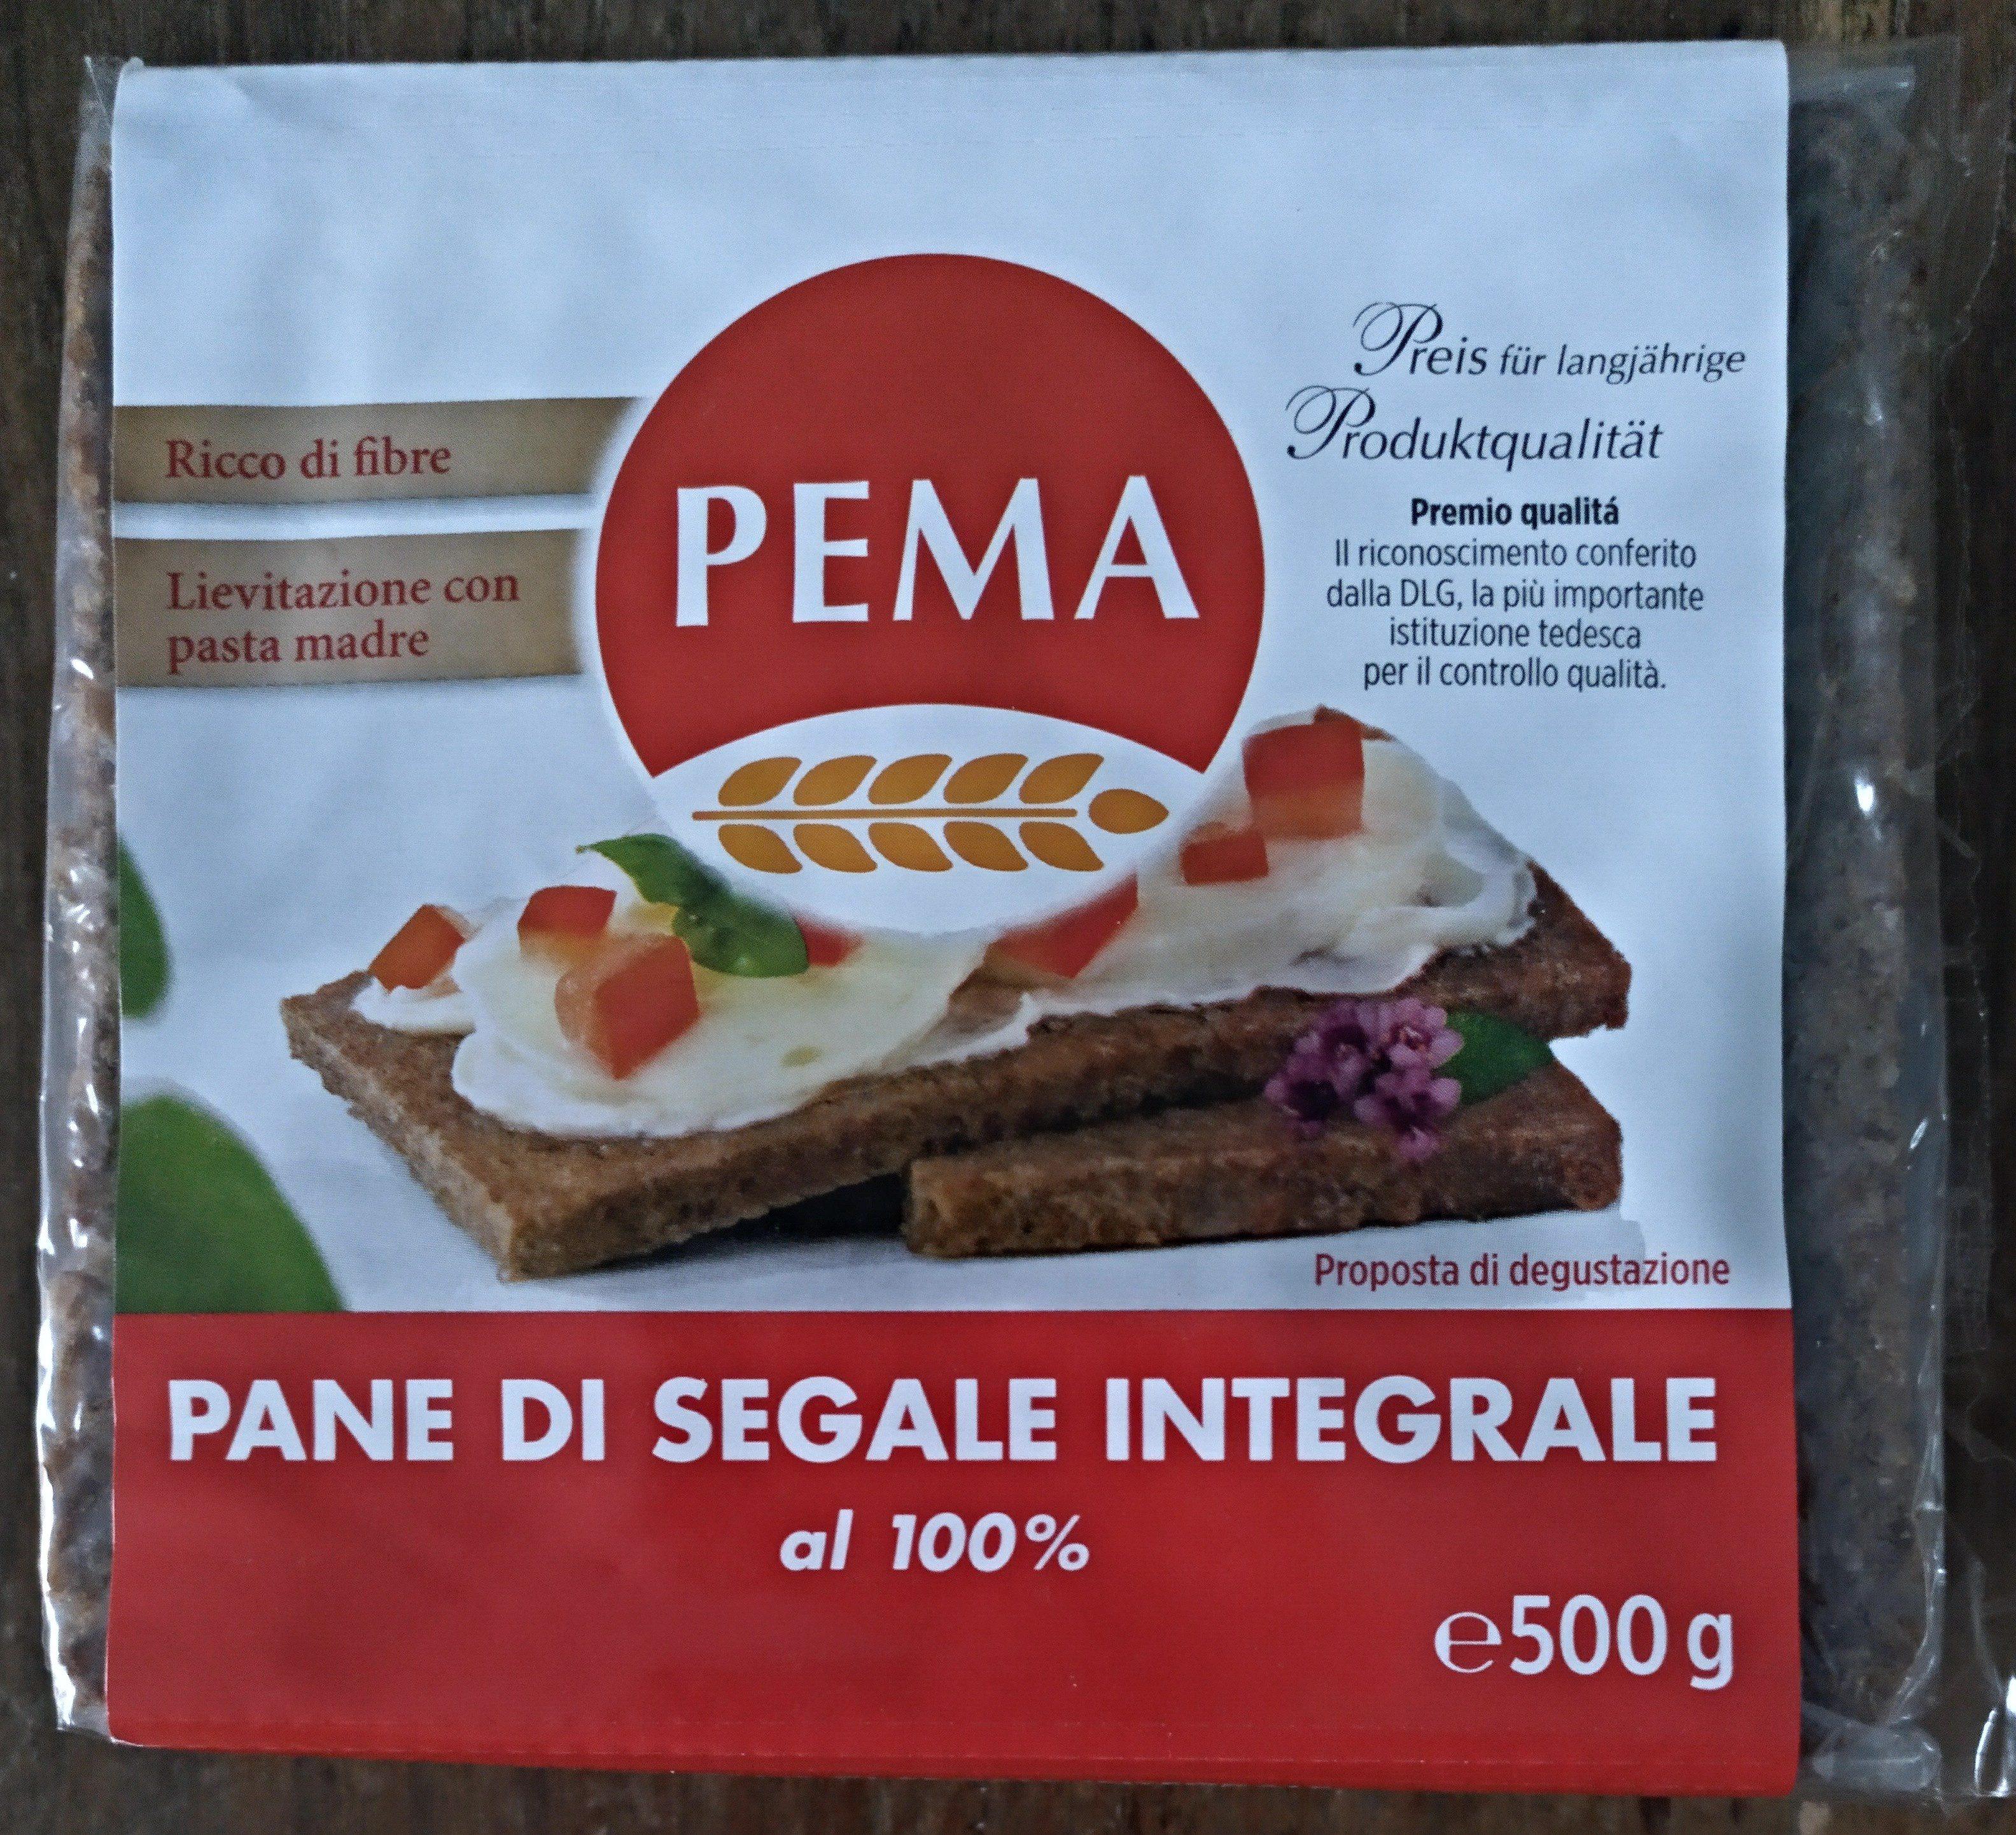 pane di segale integrale - Product - fi